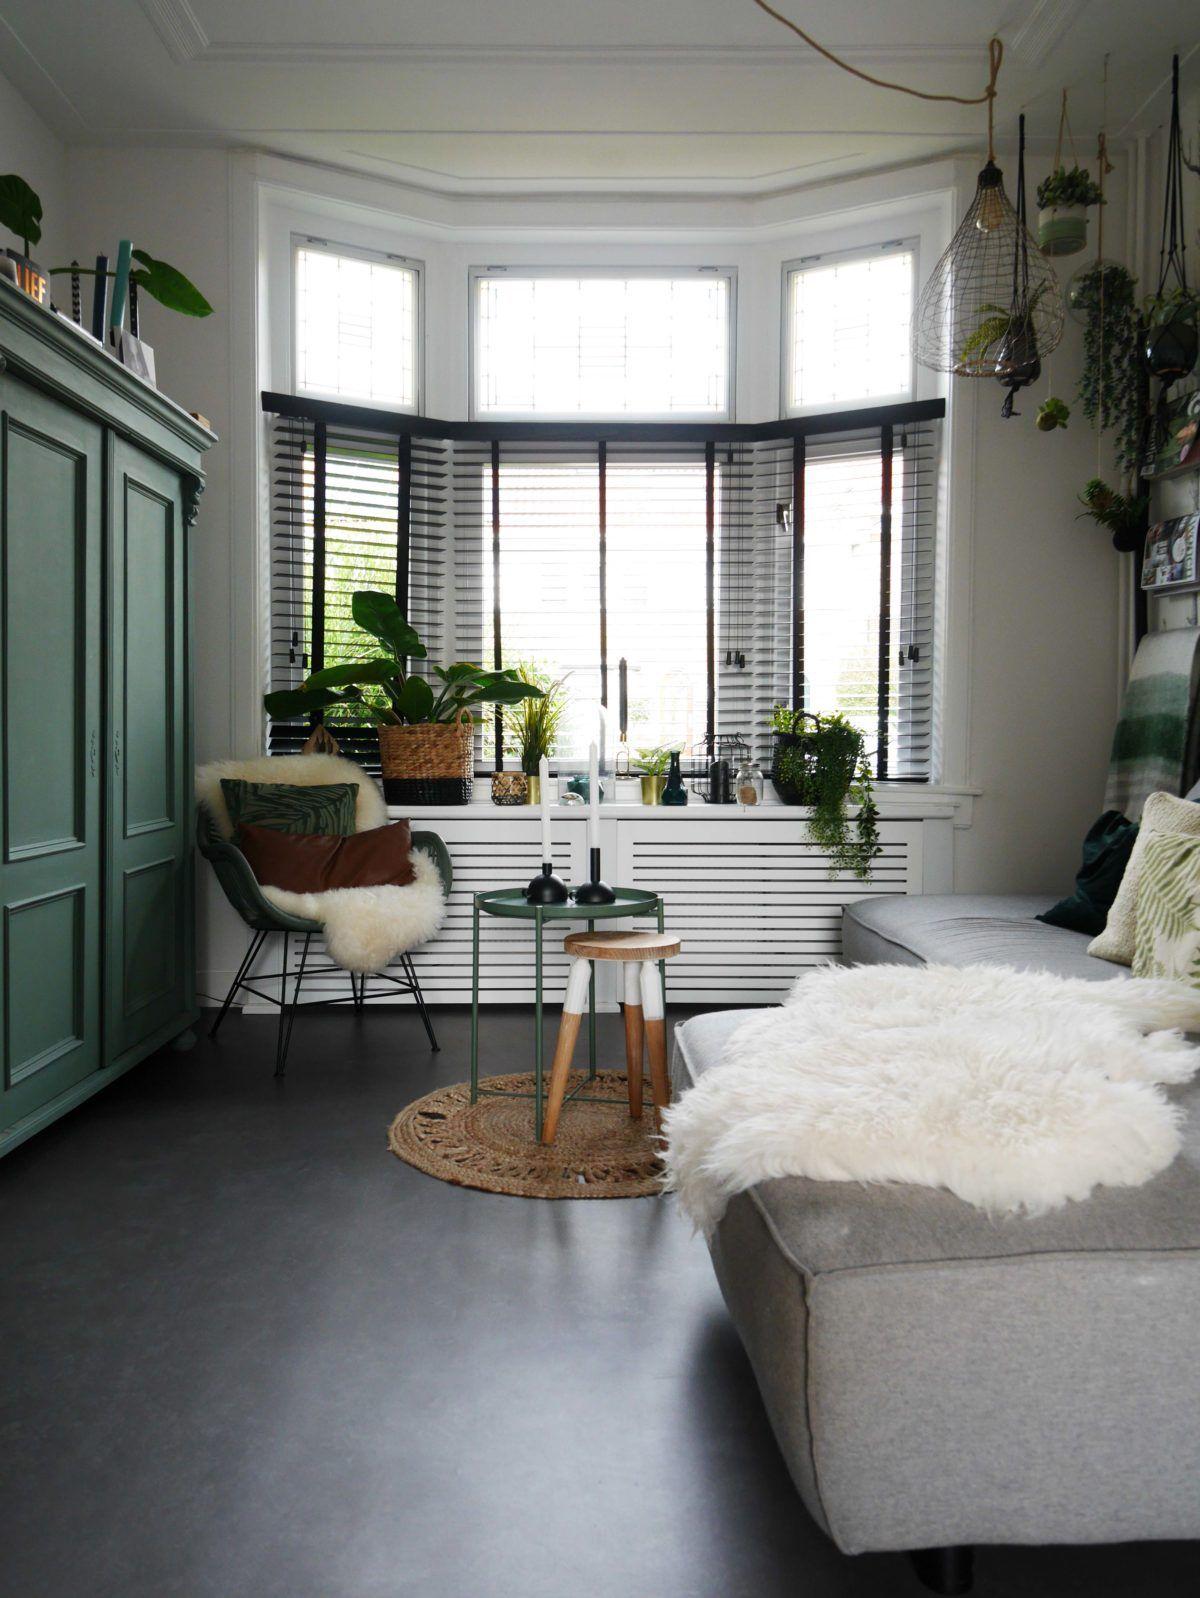 erker jaren 30 woonkamer huiskamer jaloezieën | Cynthia.nl blogposts ...